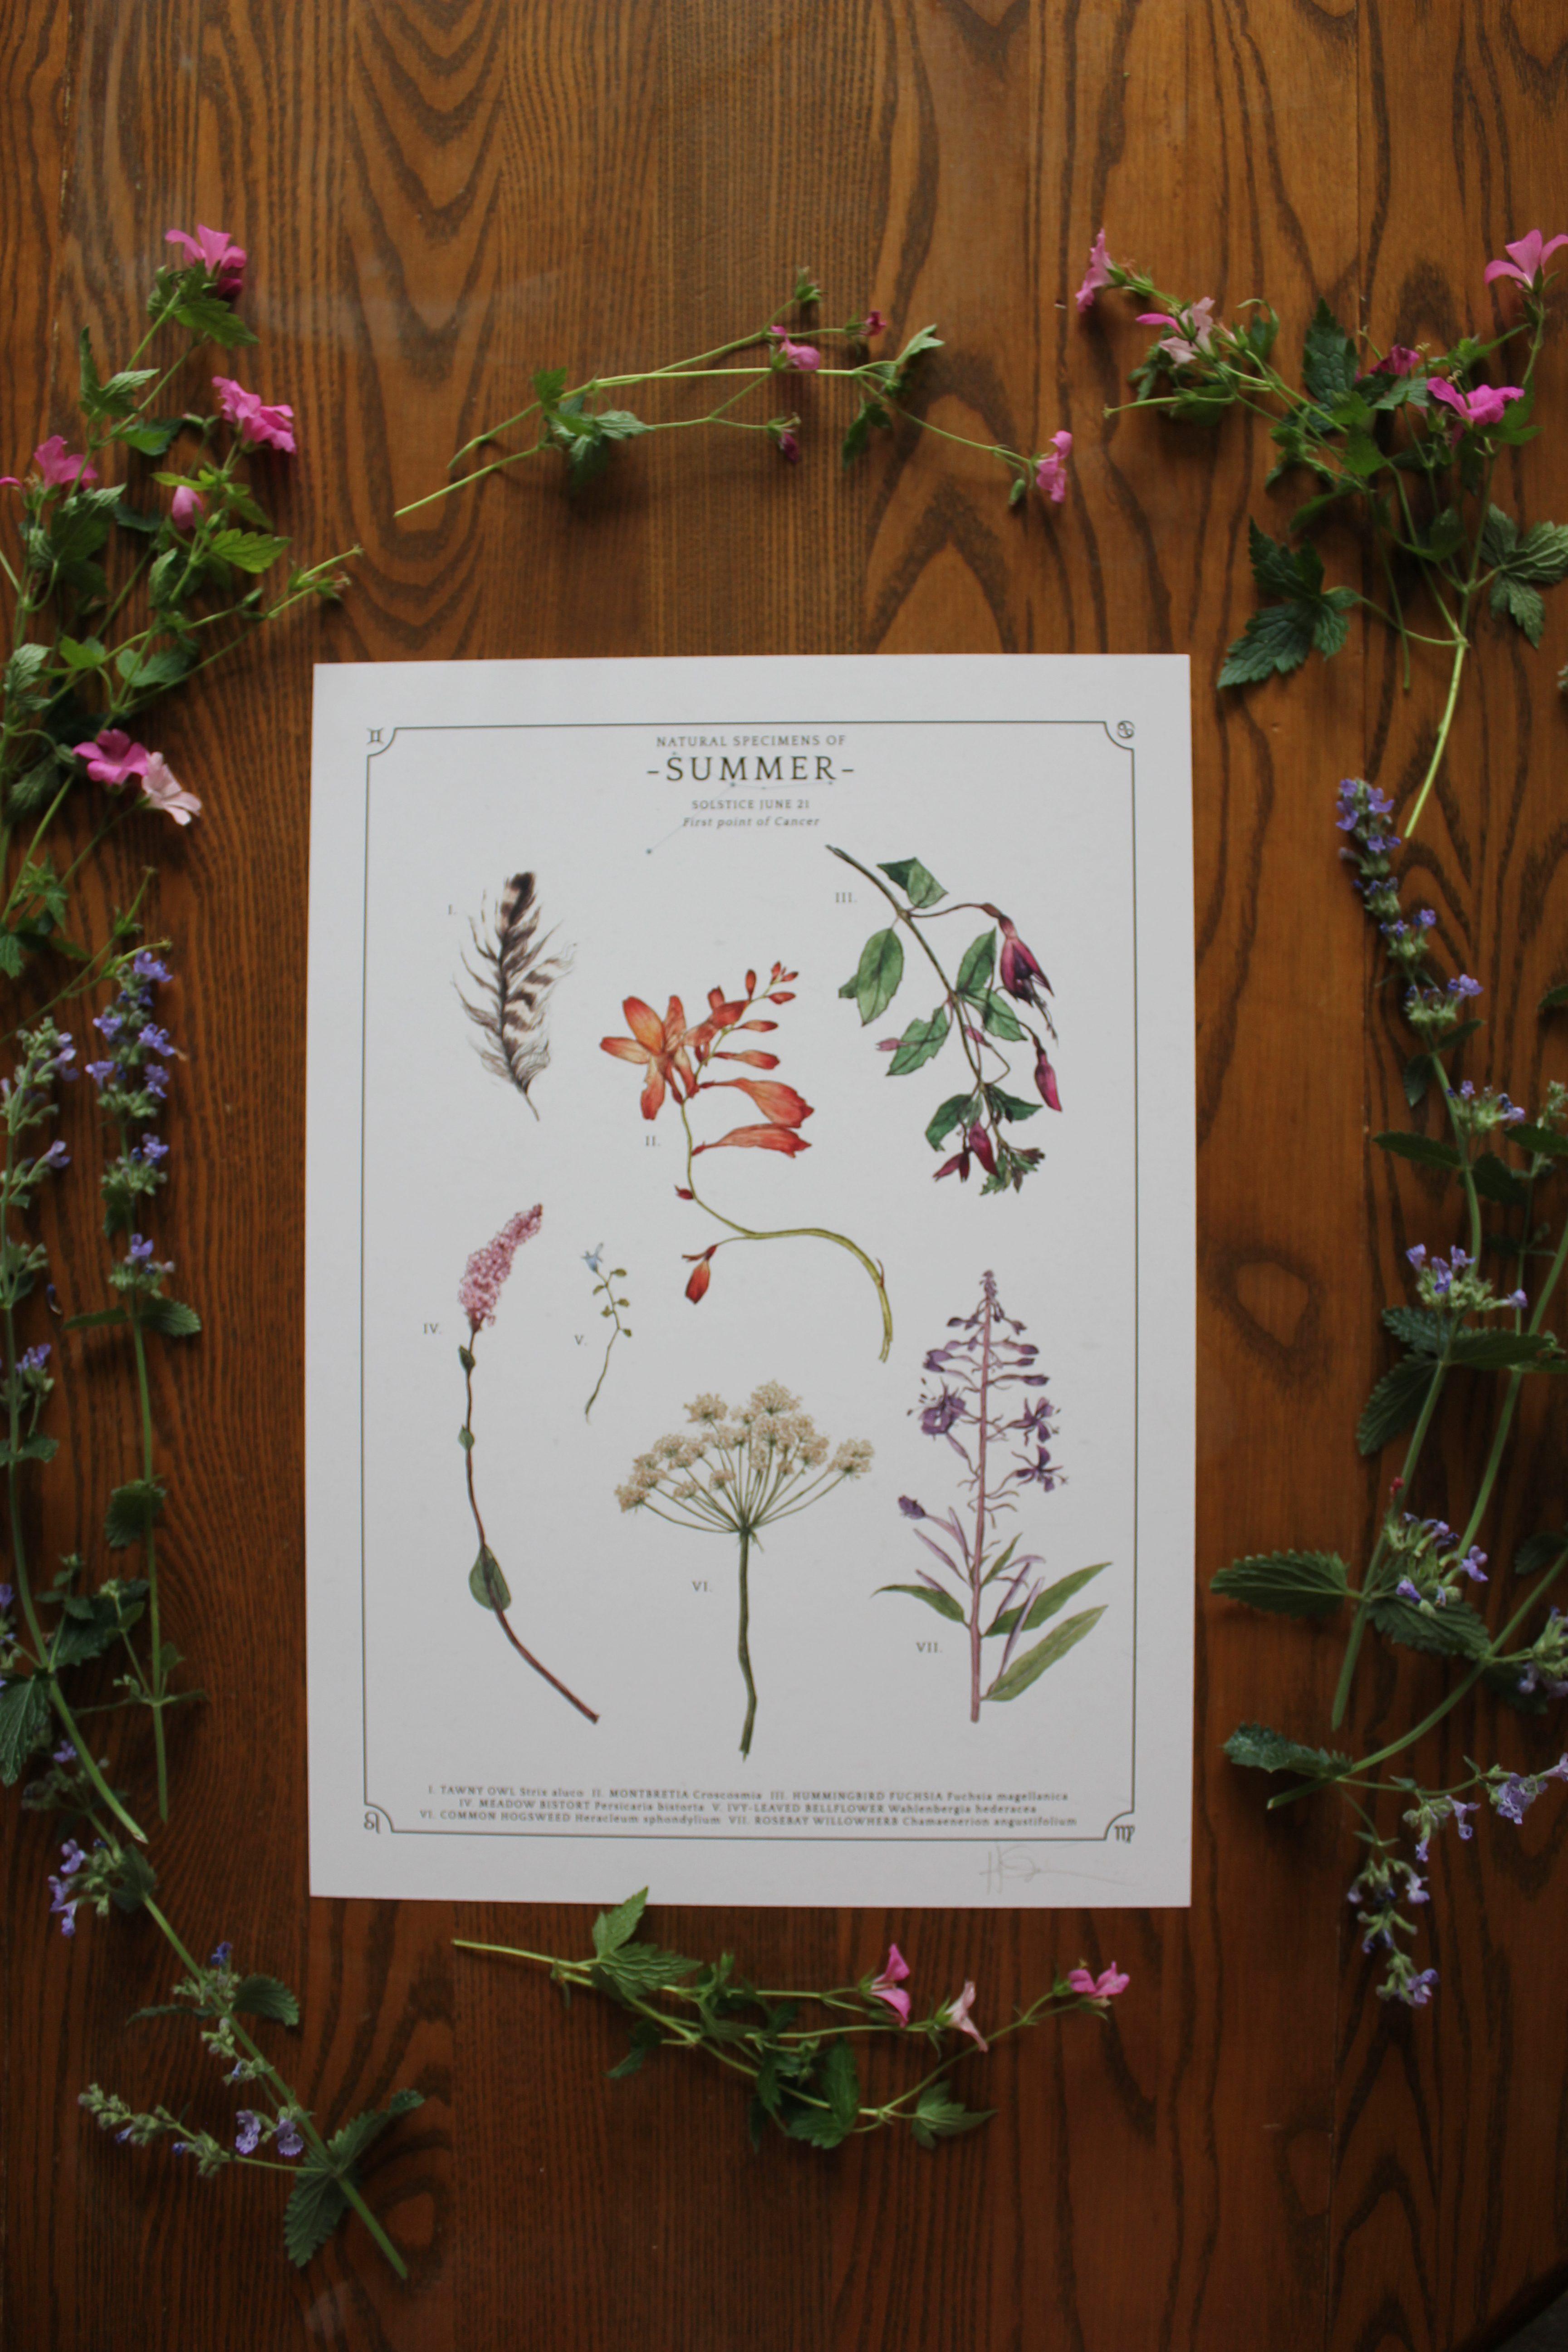 5 ways to celebrate Midsummer